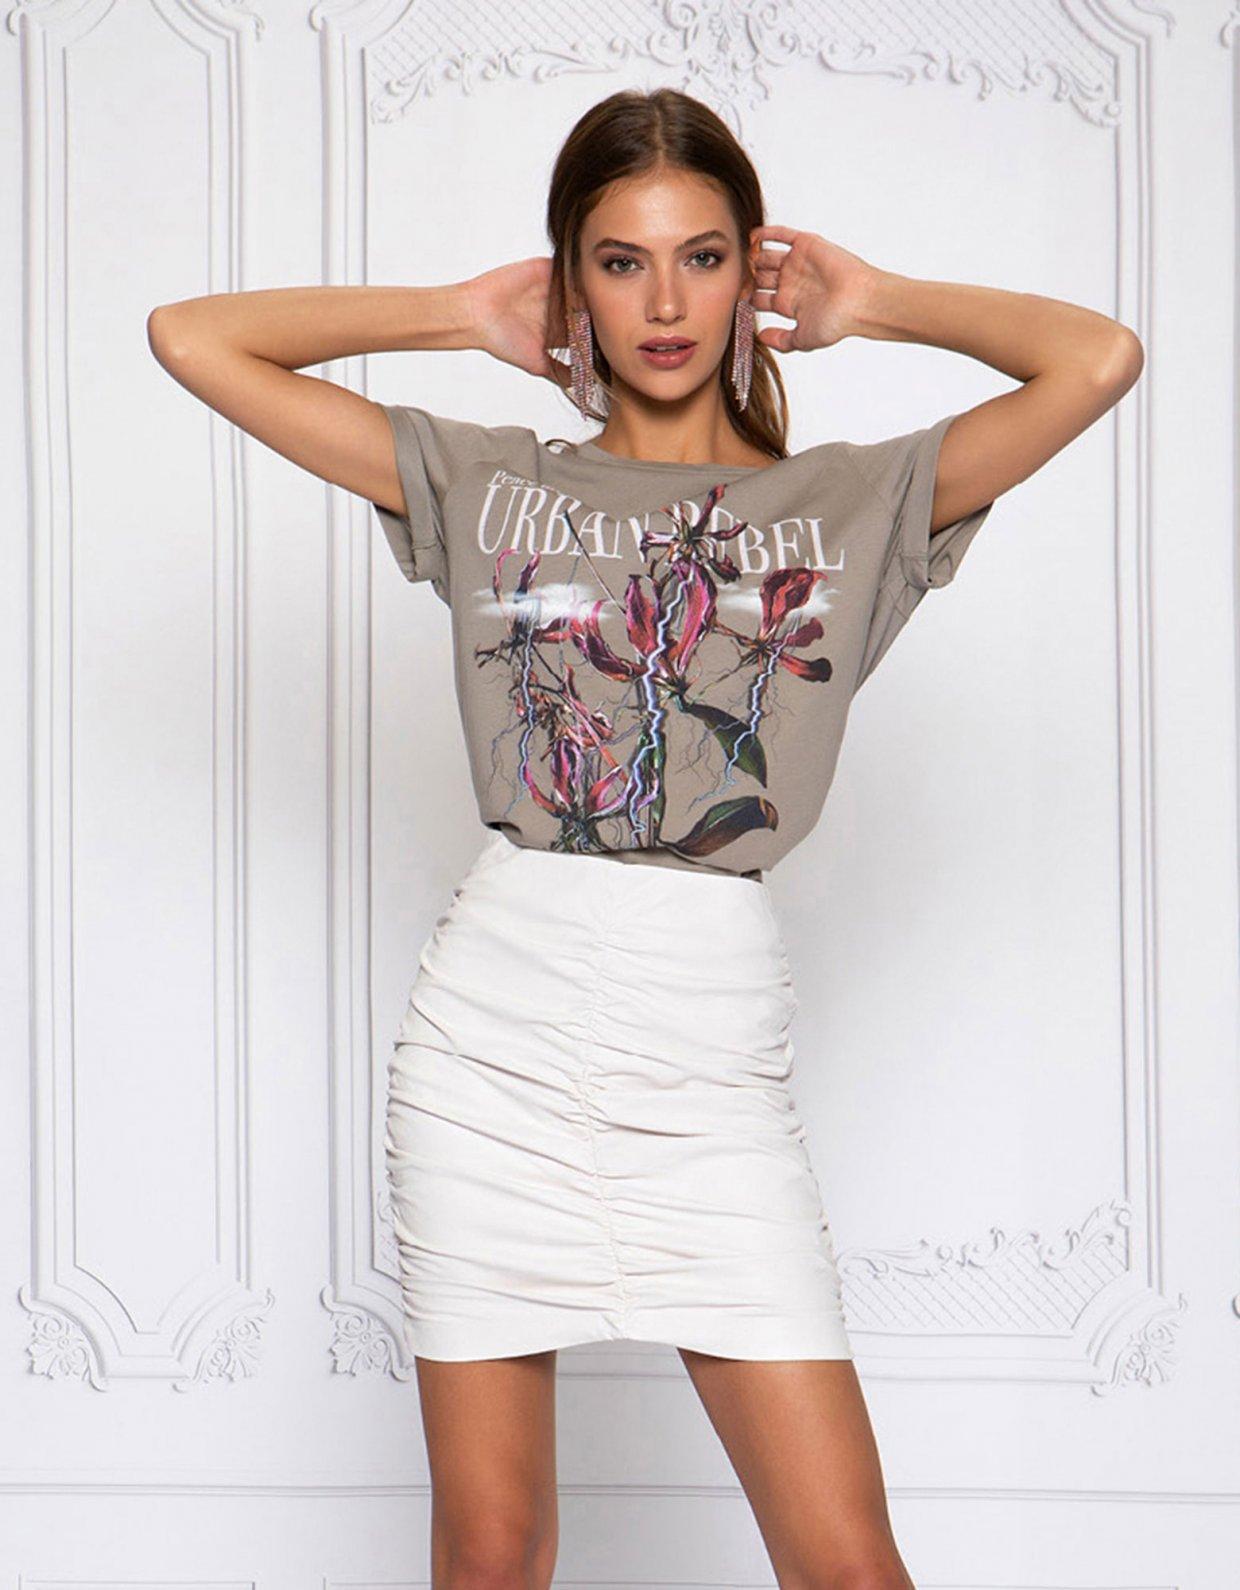 Peace & Chaos Urban rebel t-shirt